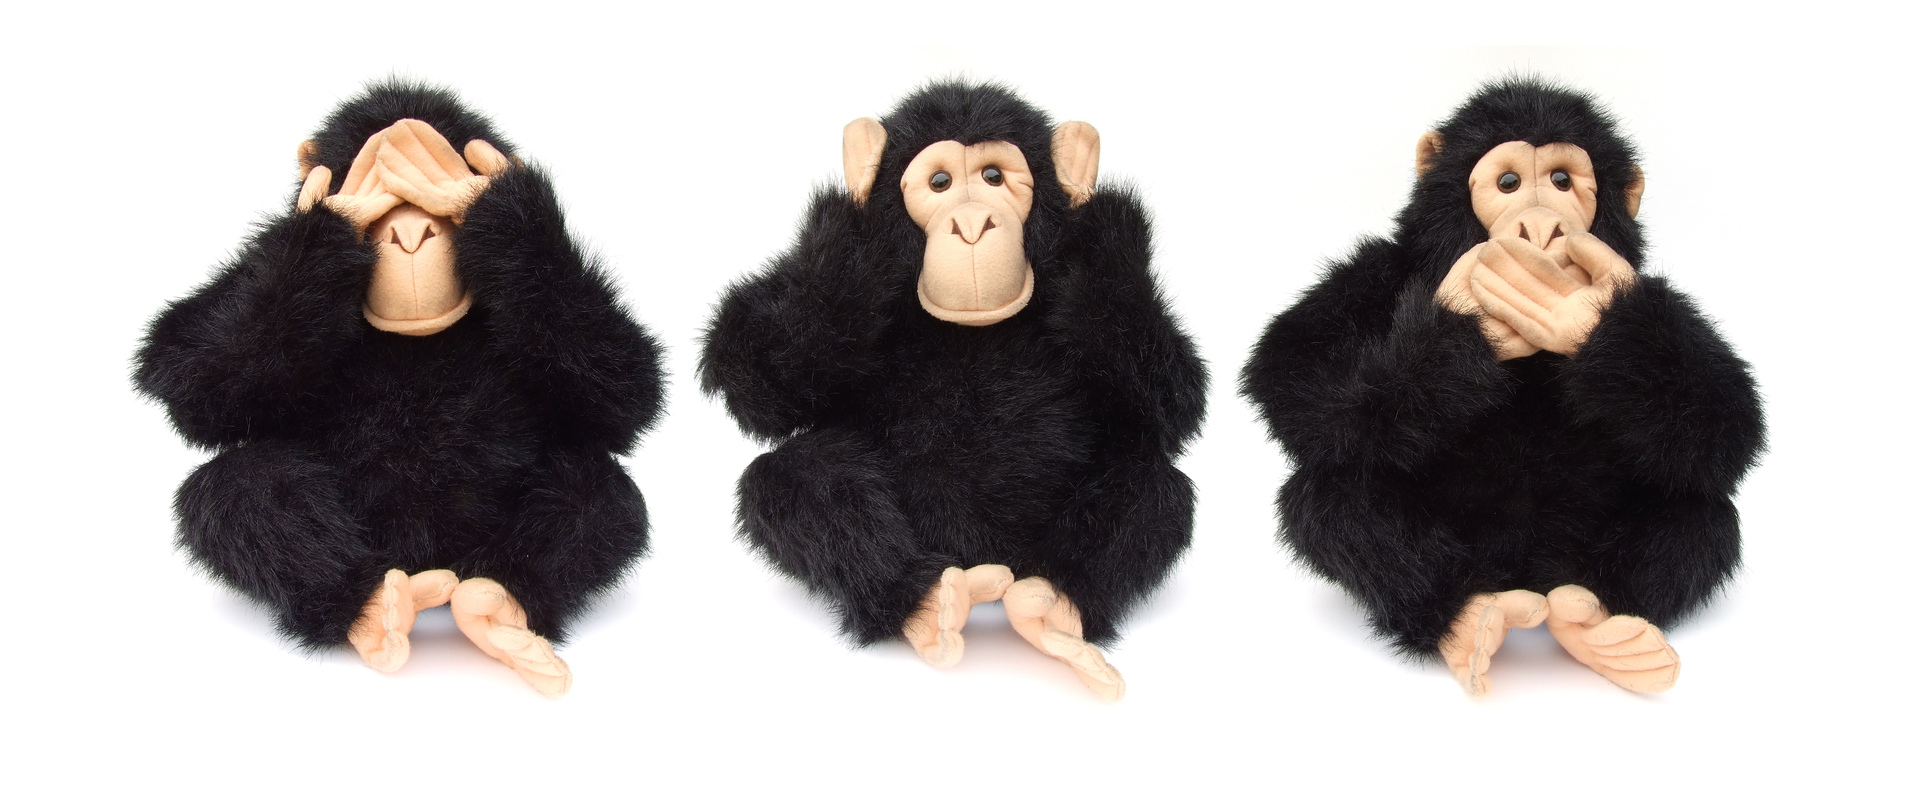 three-monkeys-1239552-1920x800